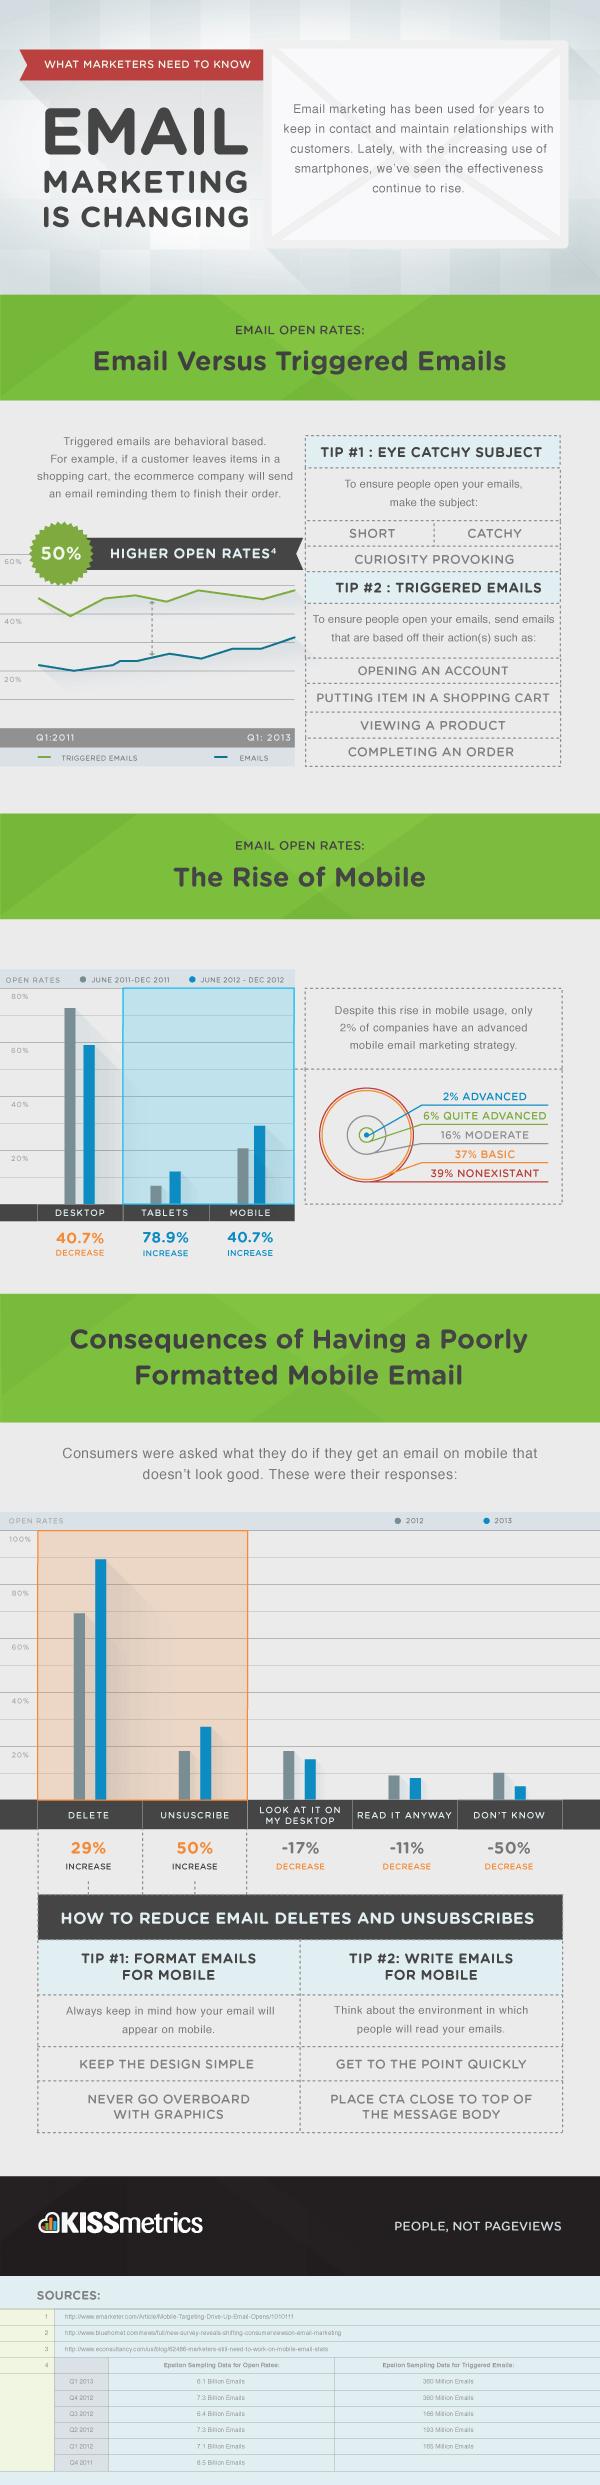 Email-Marketing-esta-cambiando